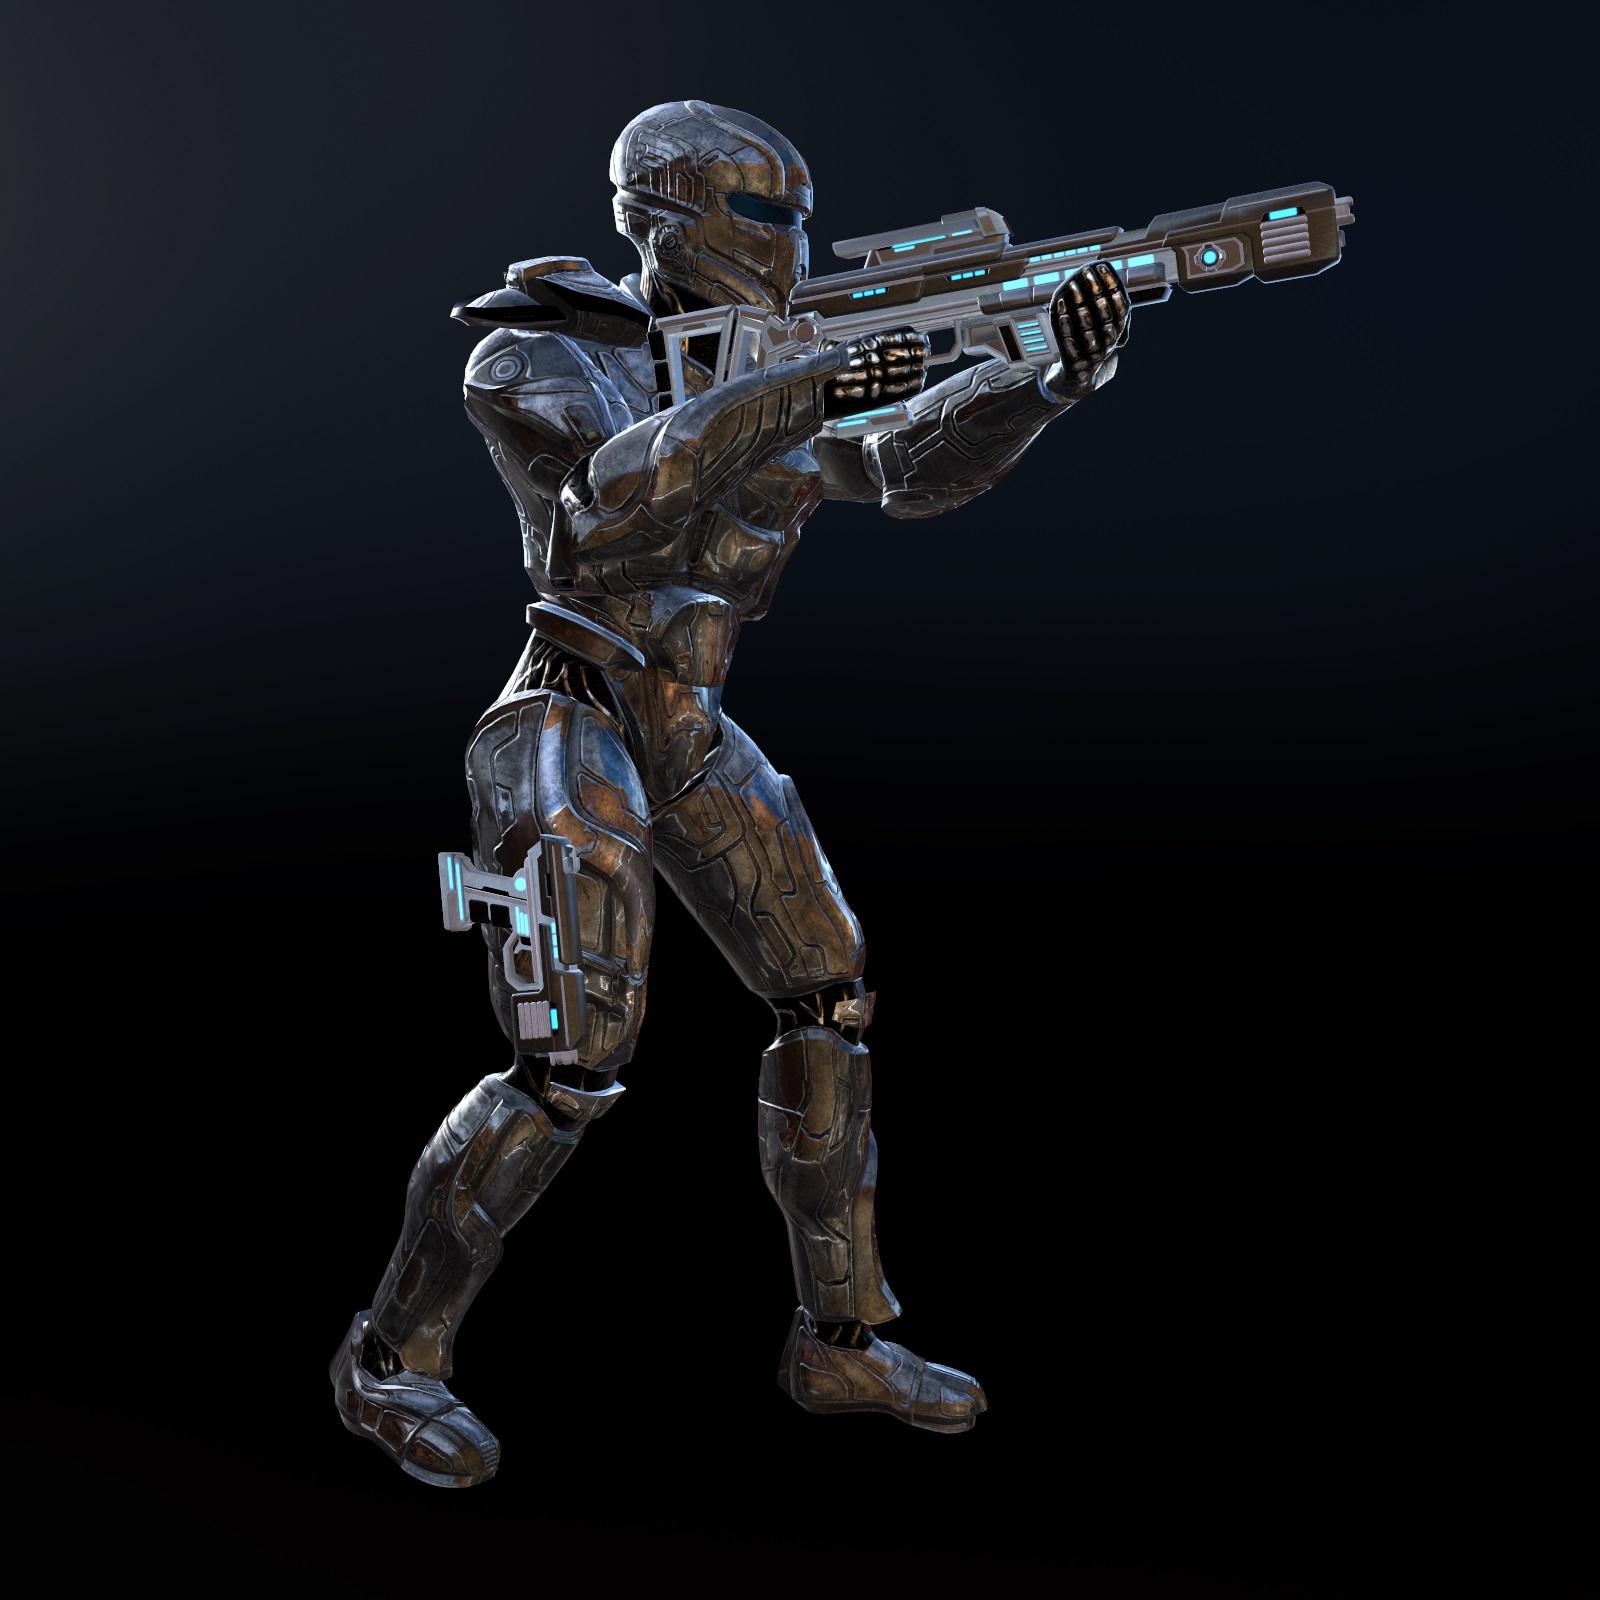 Star Trooper